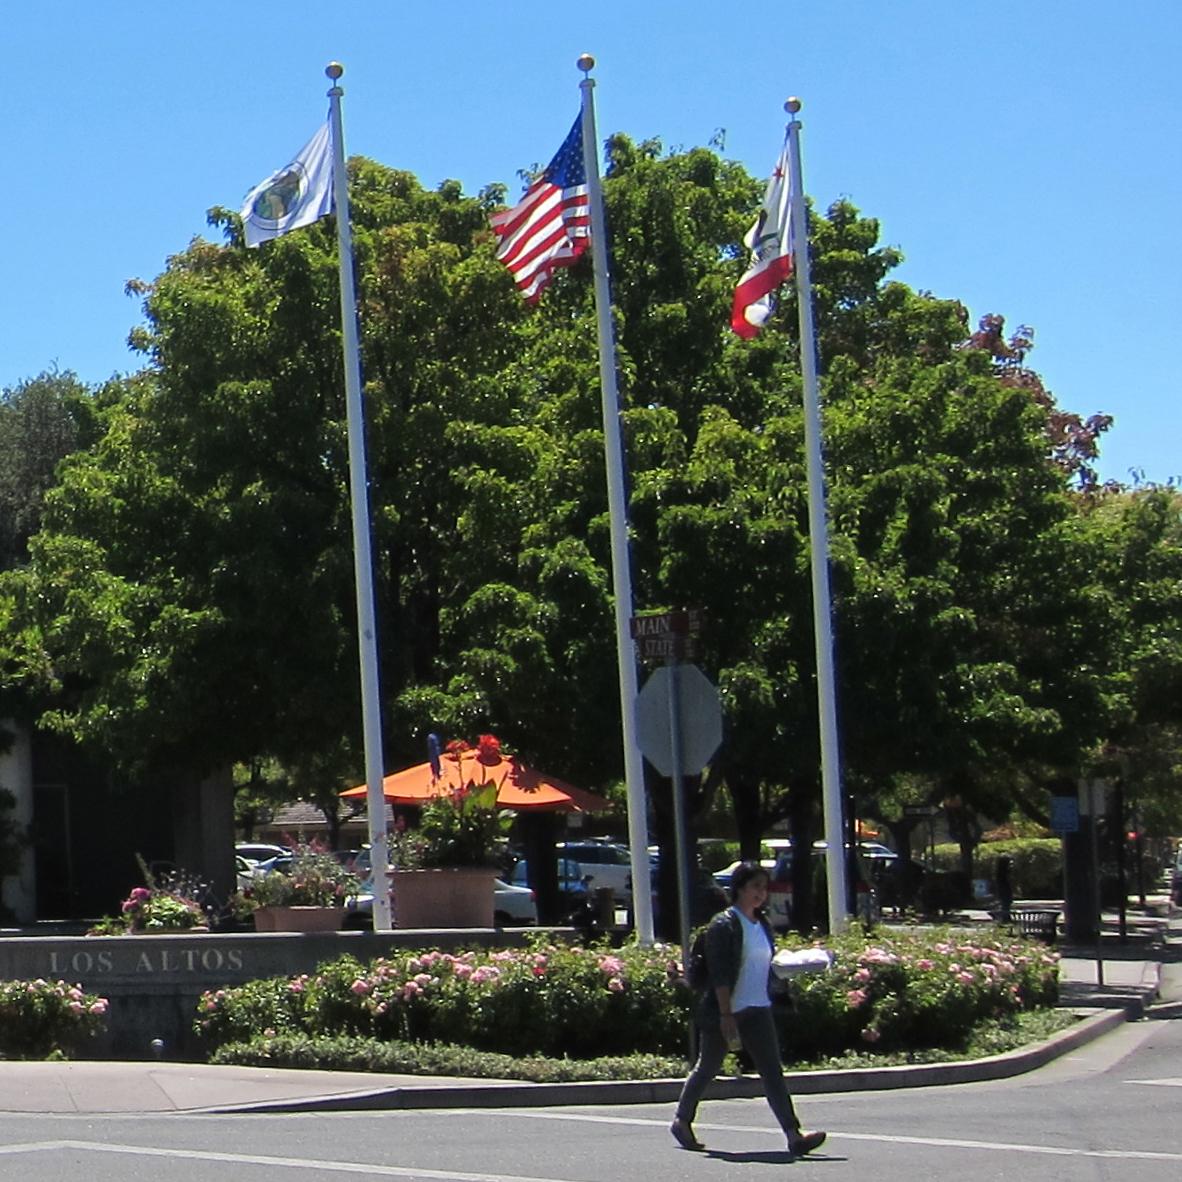 Downtown image_community plaza crop2.jpg